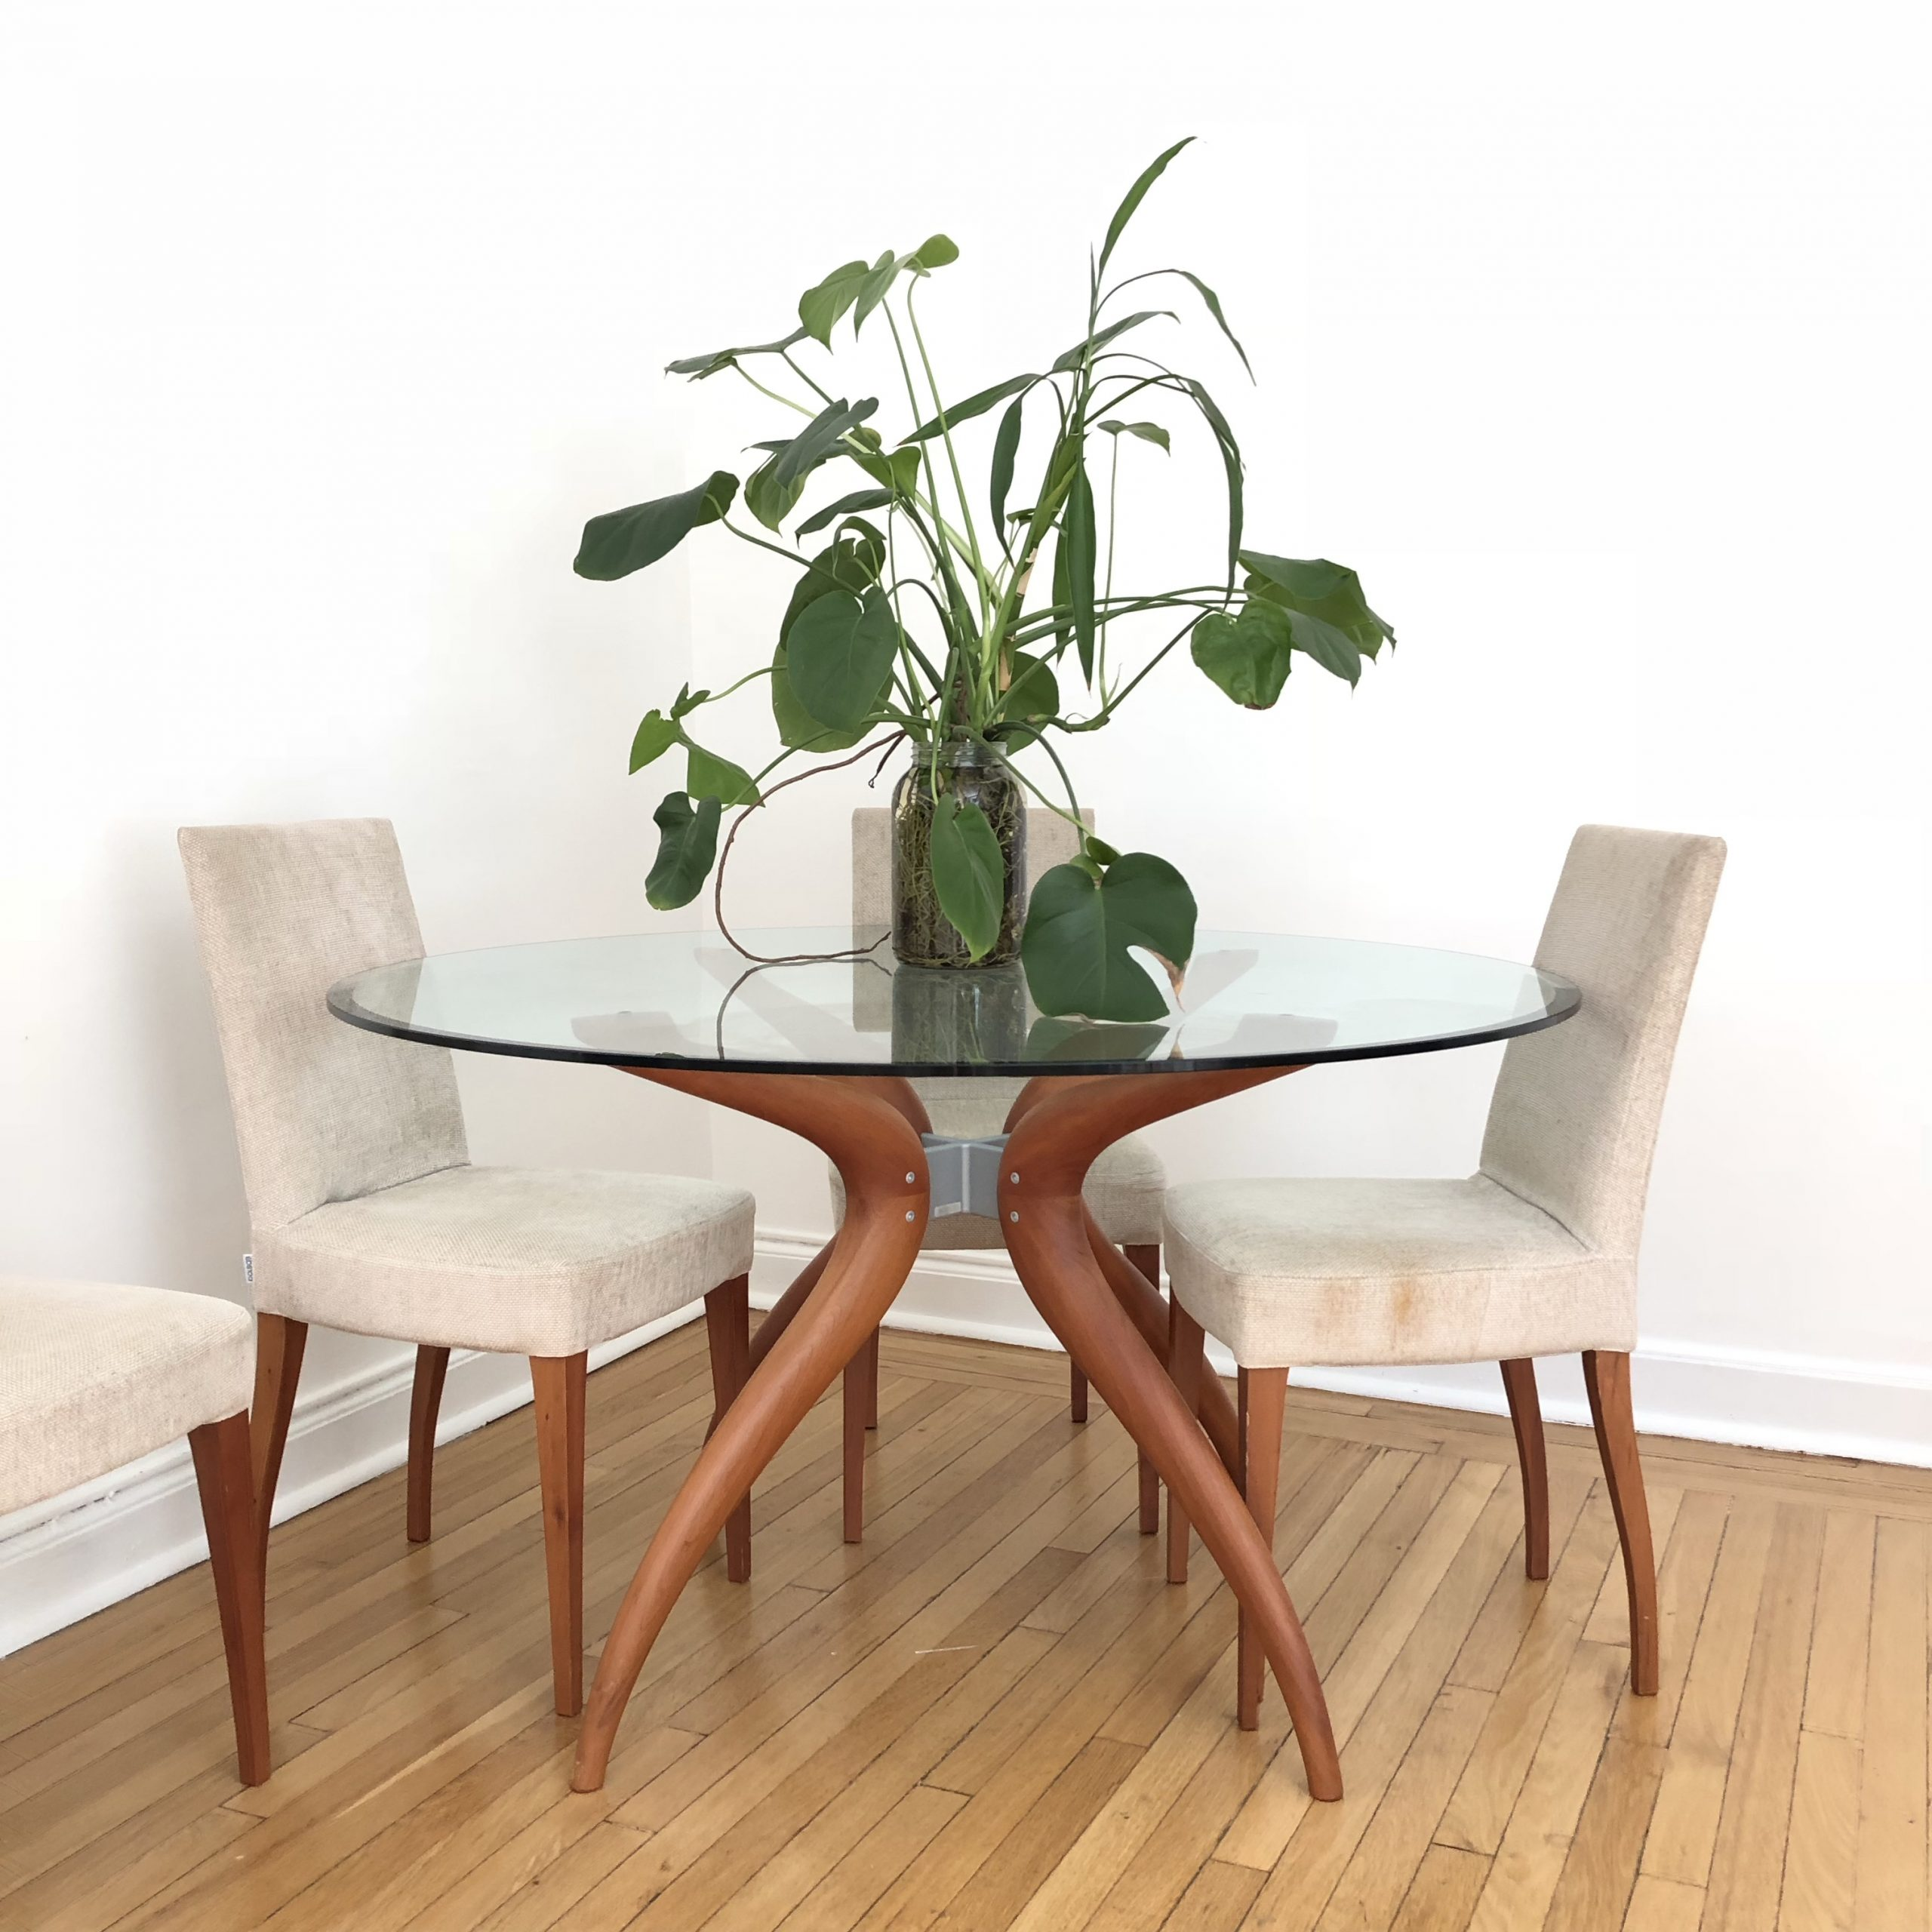 Porada Retro Round Glass Top Wooden Legs Dining – Depop For Recent Retro Round Glasstop Dining Tables (View 2 of 30)